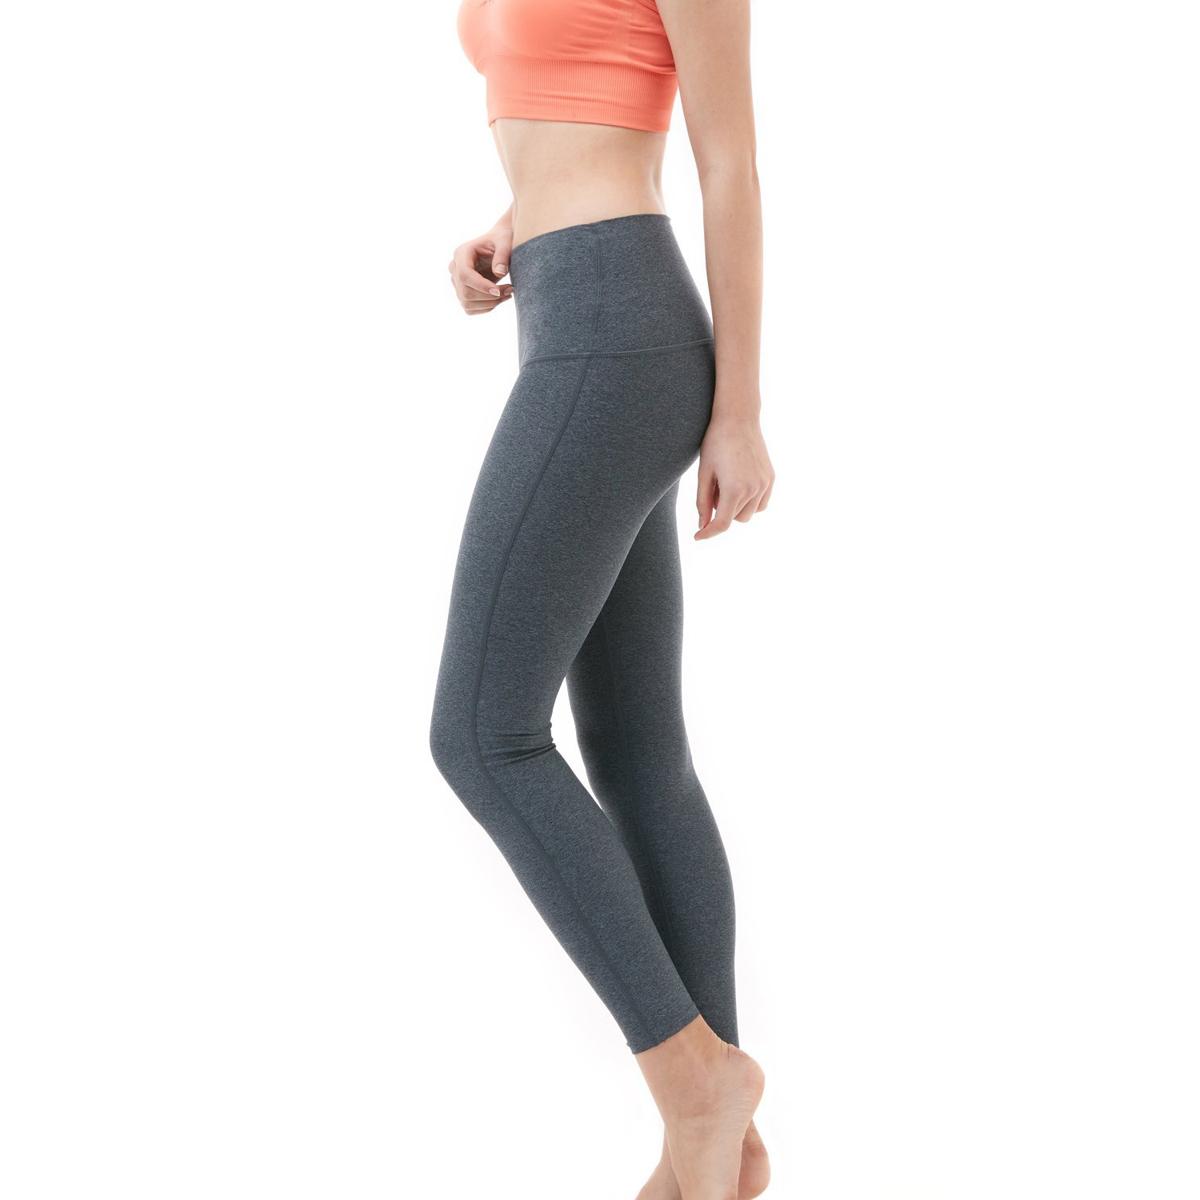 thumbnail 11 - TSLA Tesla FYP42 Women's High-Waisted Ultra-Stretch Tummy Control Yoga Pants